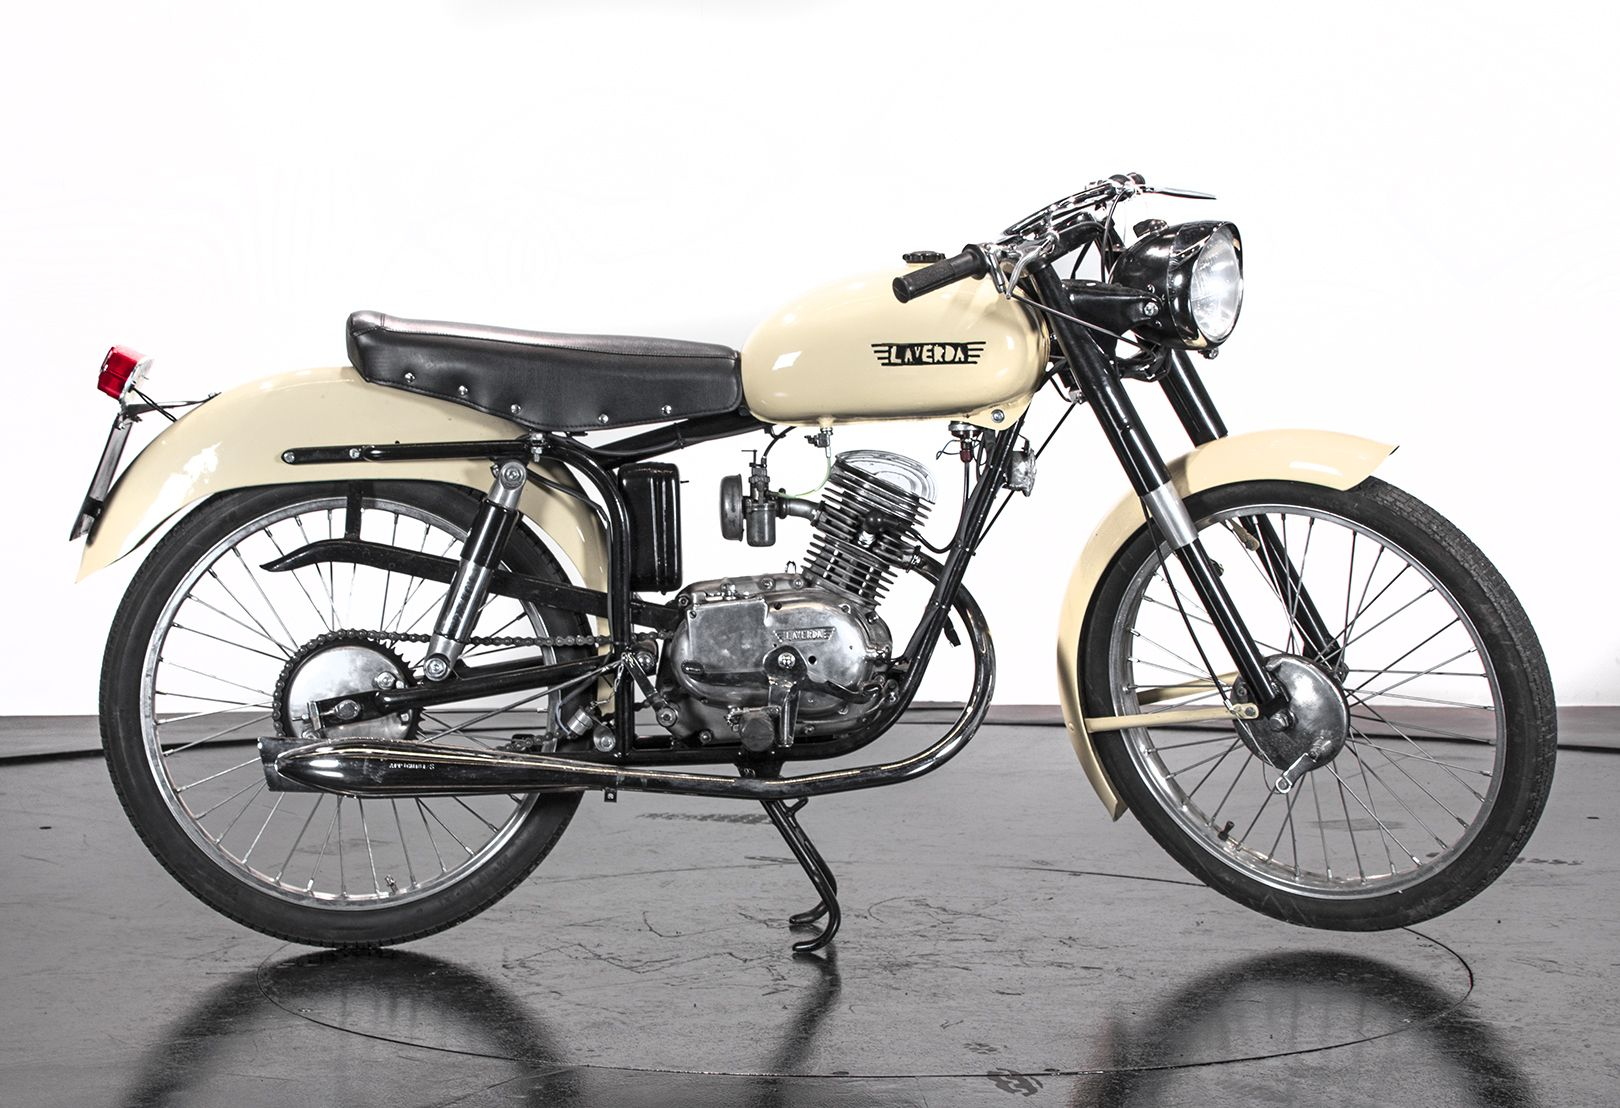 1954 Laverda 75 Sport 61422